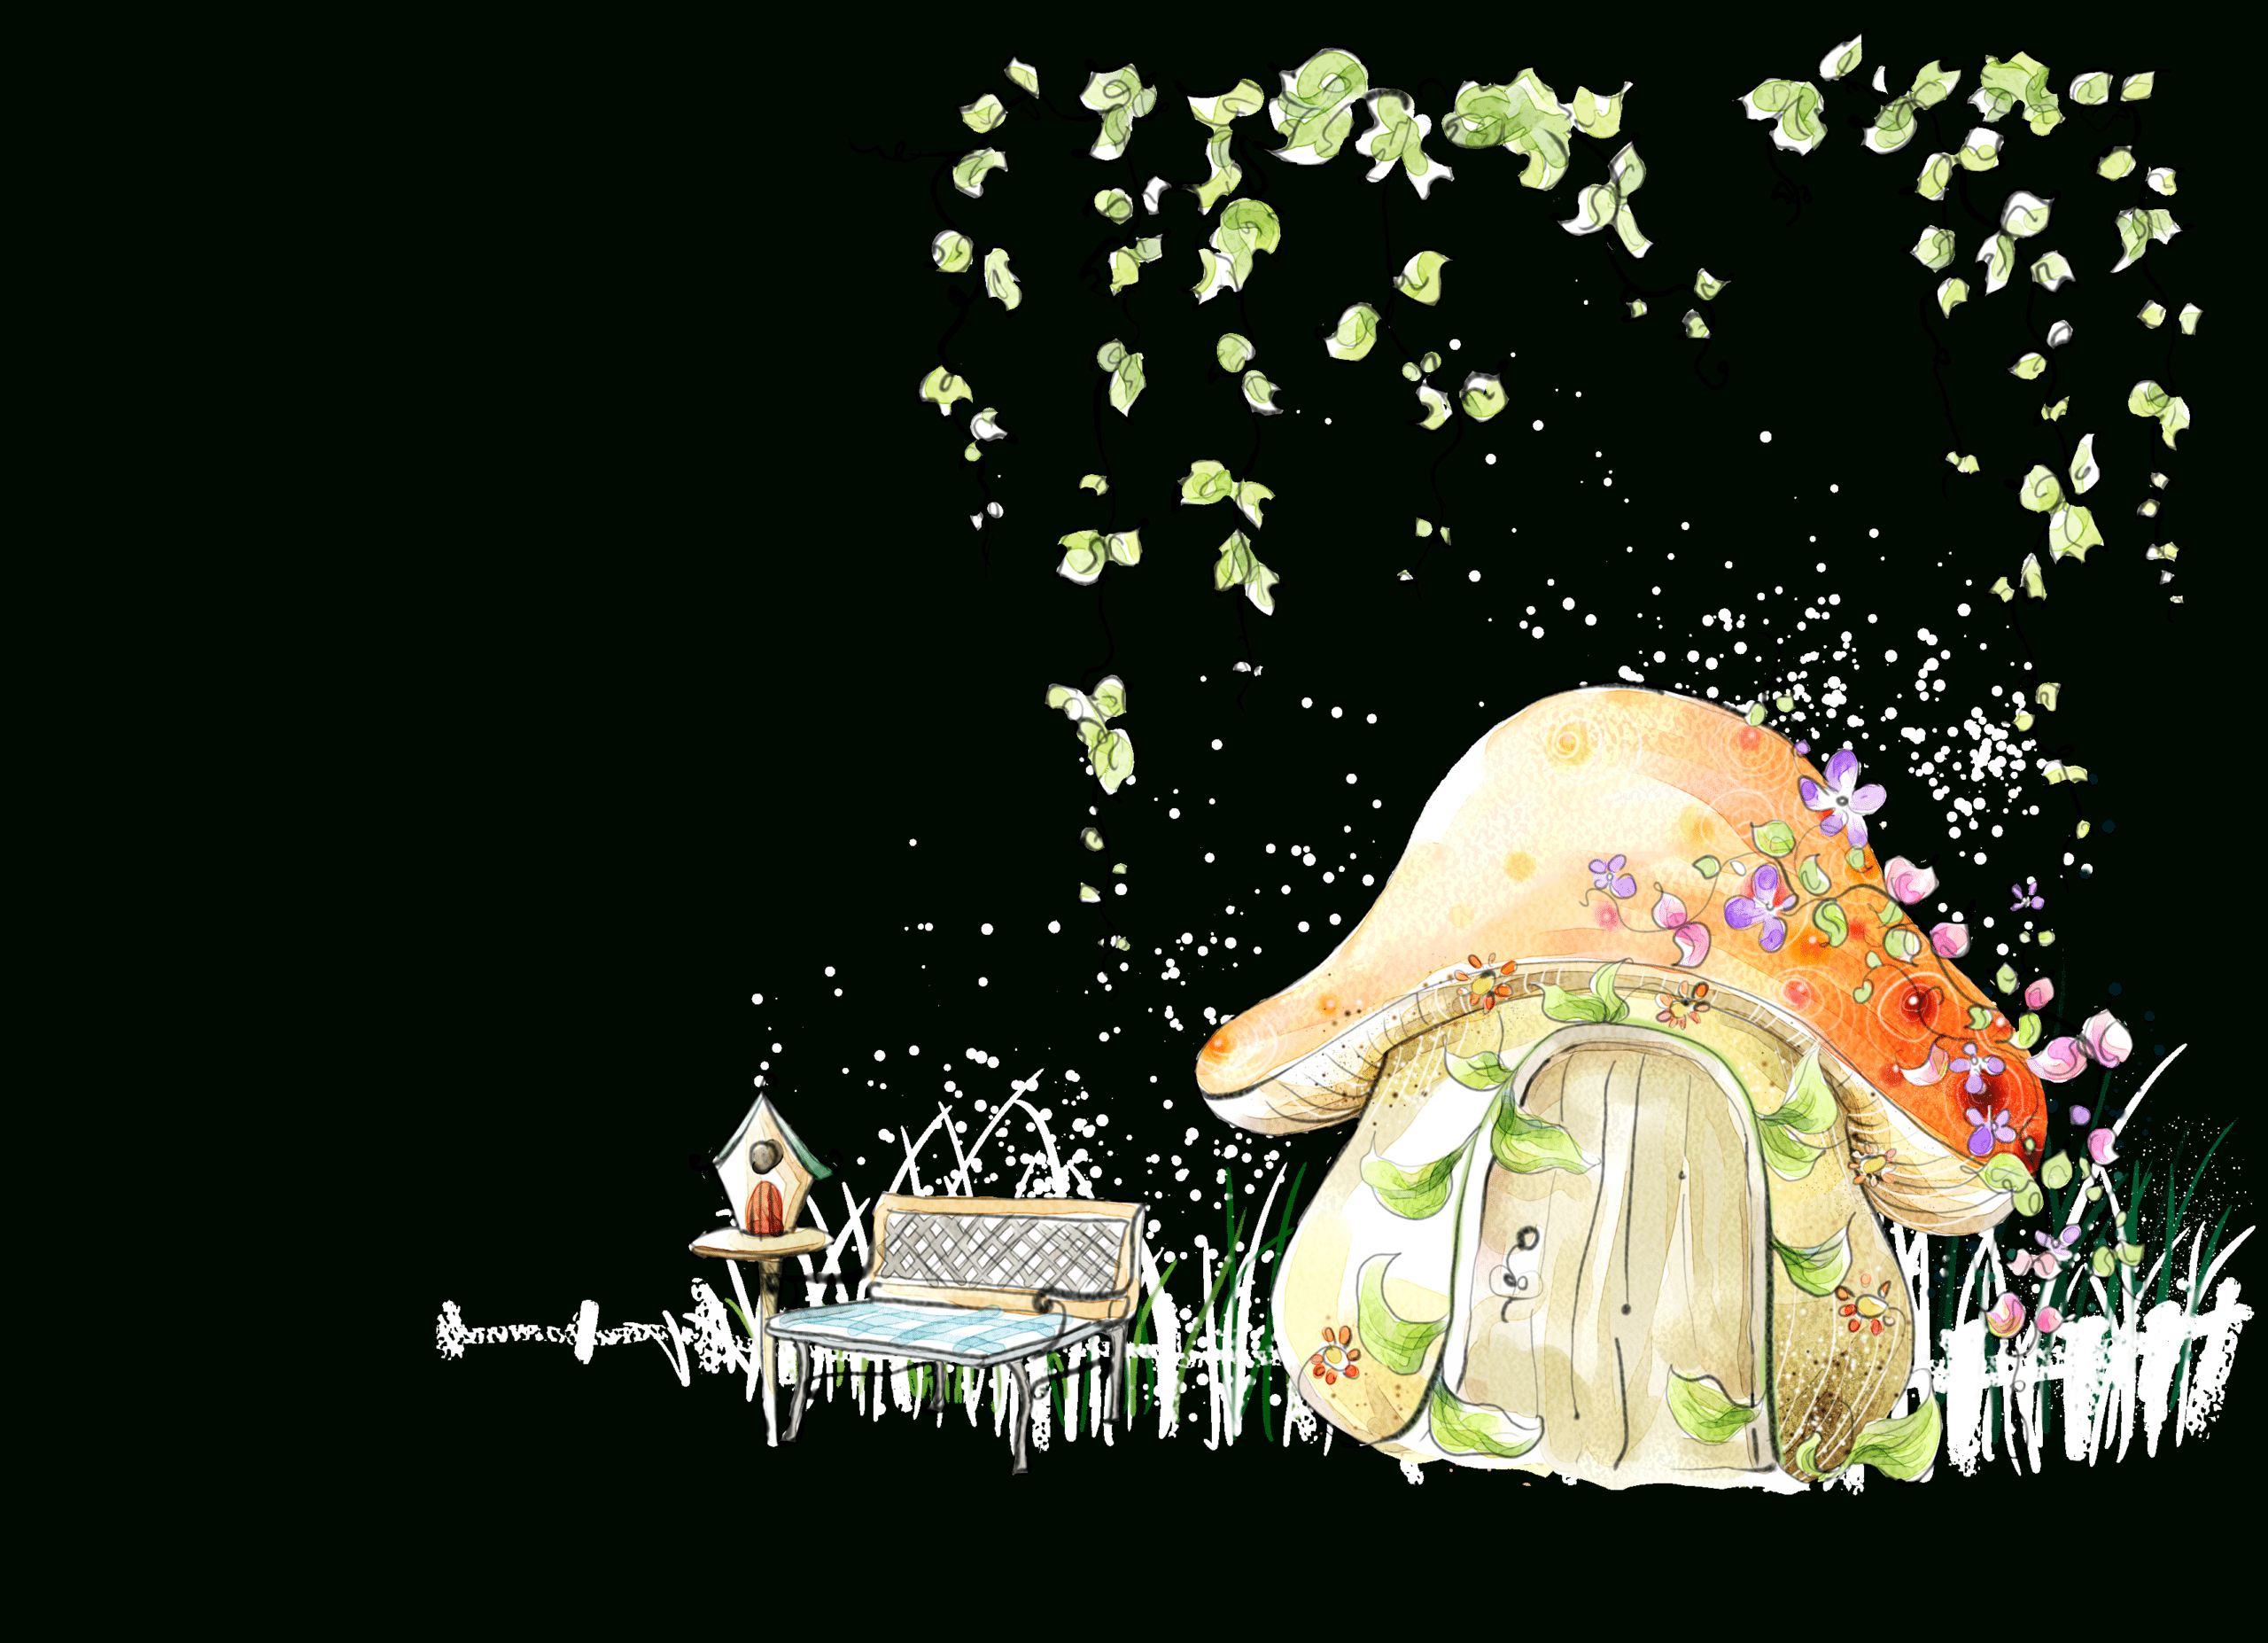 Fairy Tale Template Microsoft Powerpoint Illustration Regarding Fairy Tale Powerpoint Template